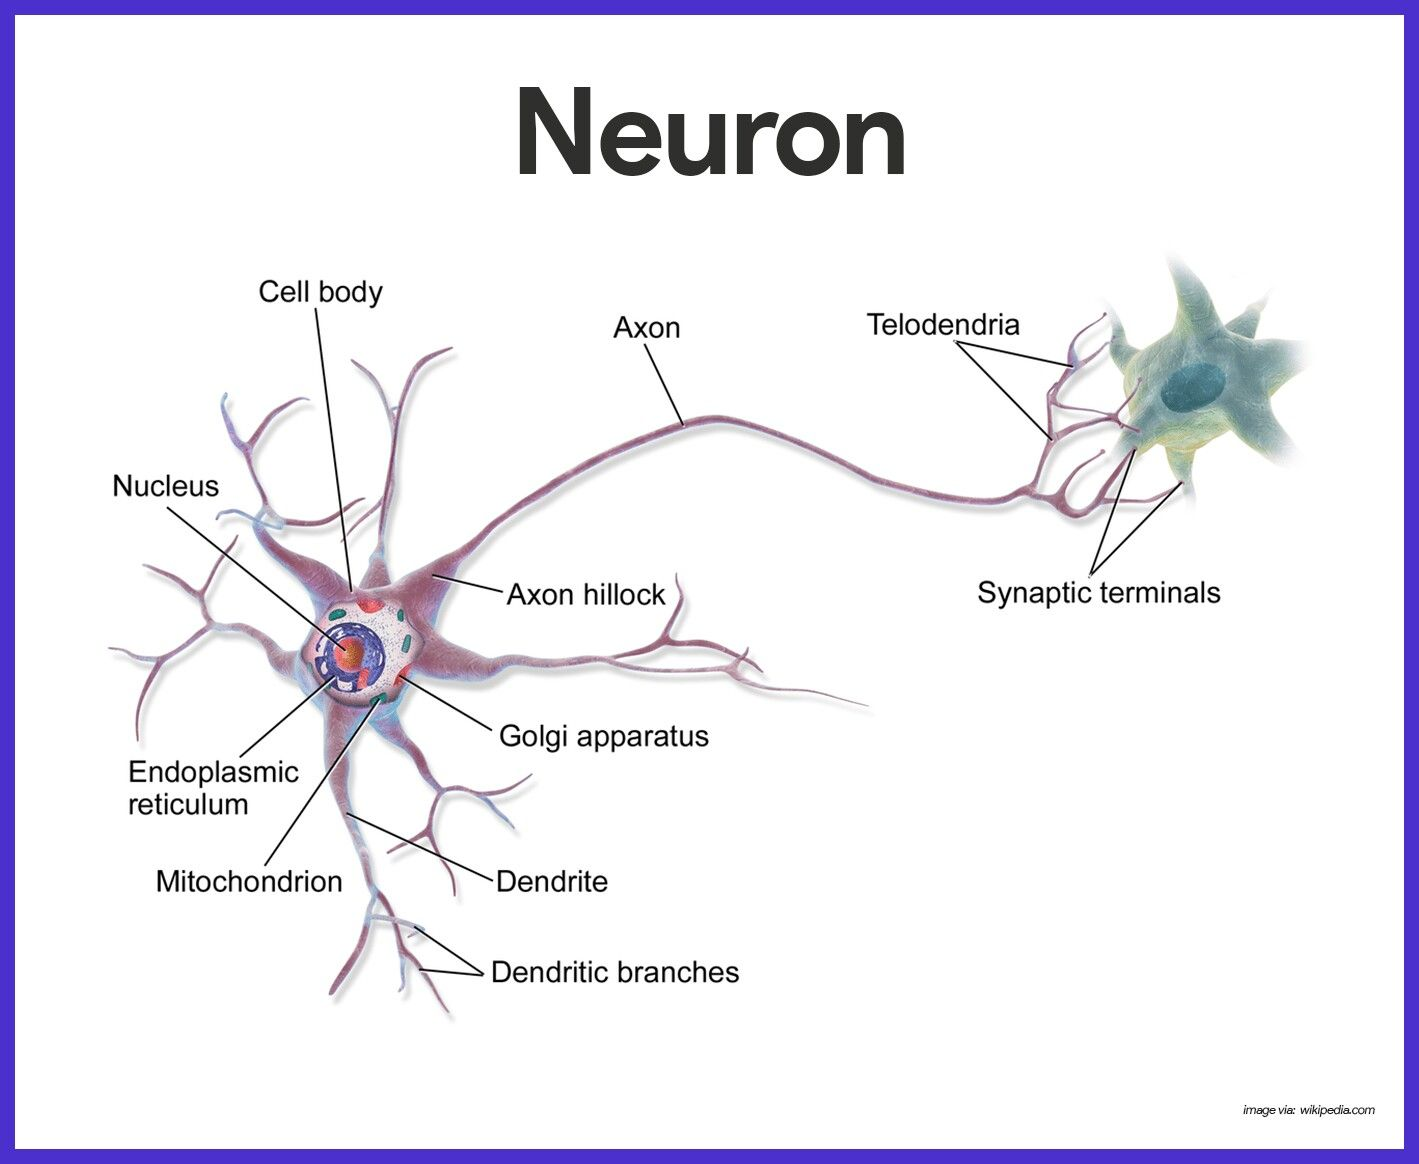 medium resolution of blausen 0657 multipolarneuron multipolar neuron wikipedia the free encyclopedia neurons autonomic nervous system